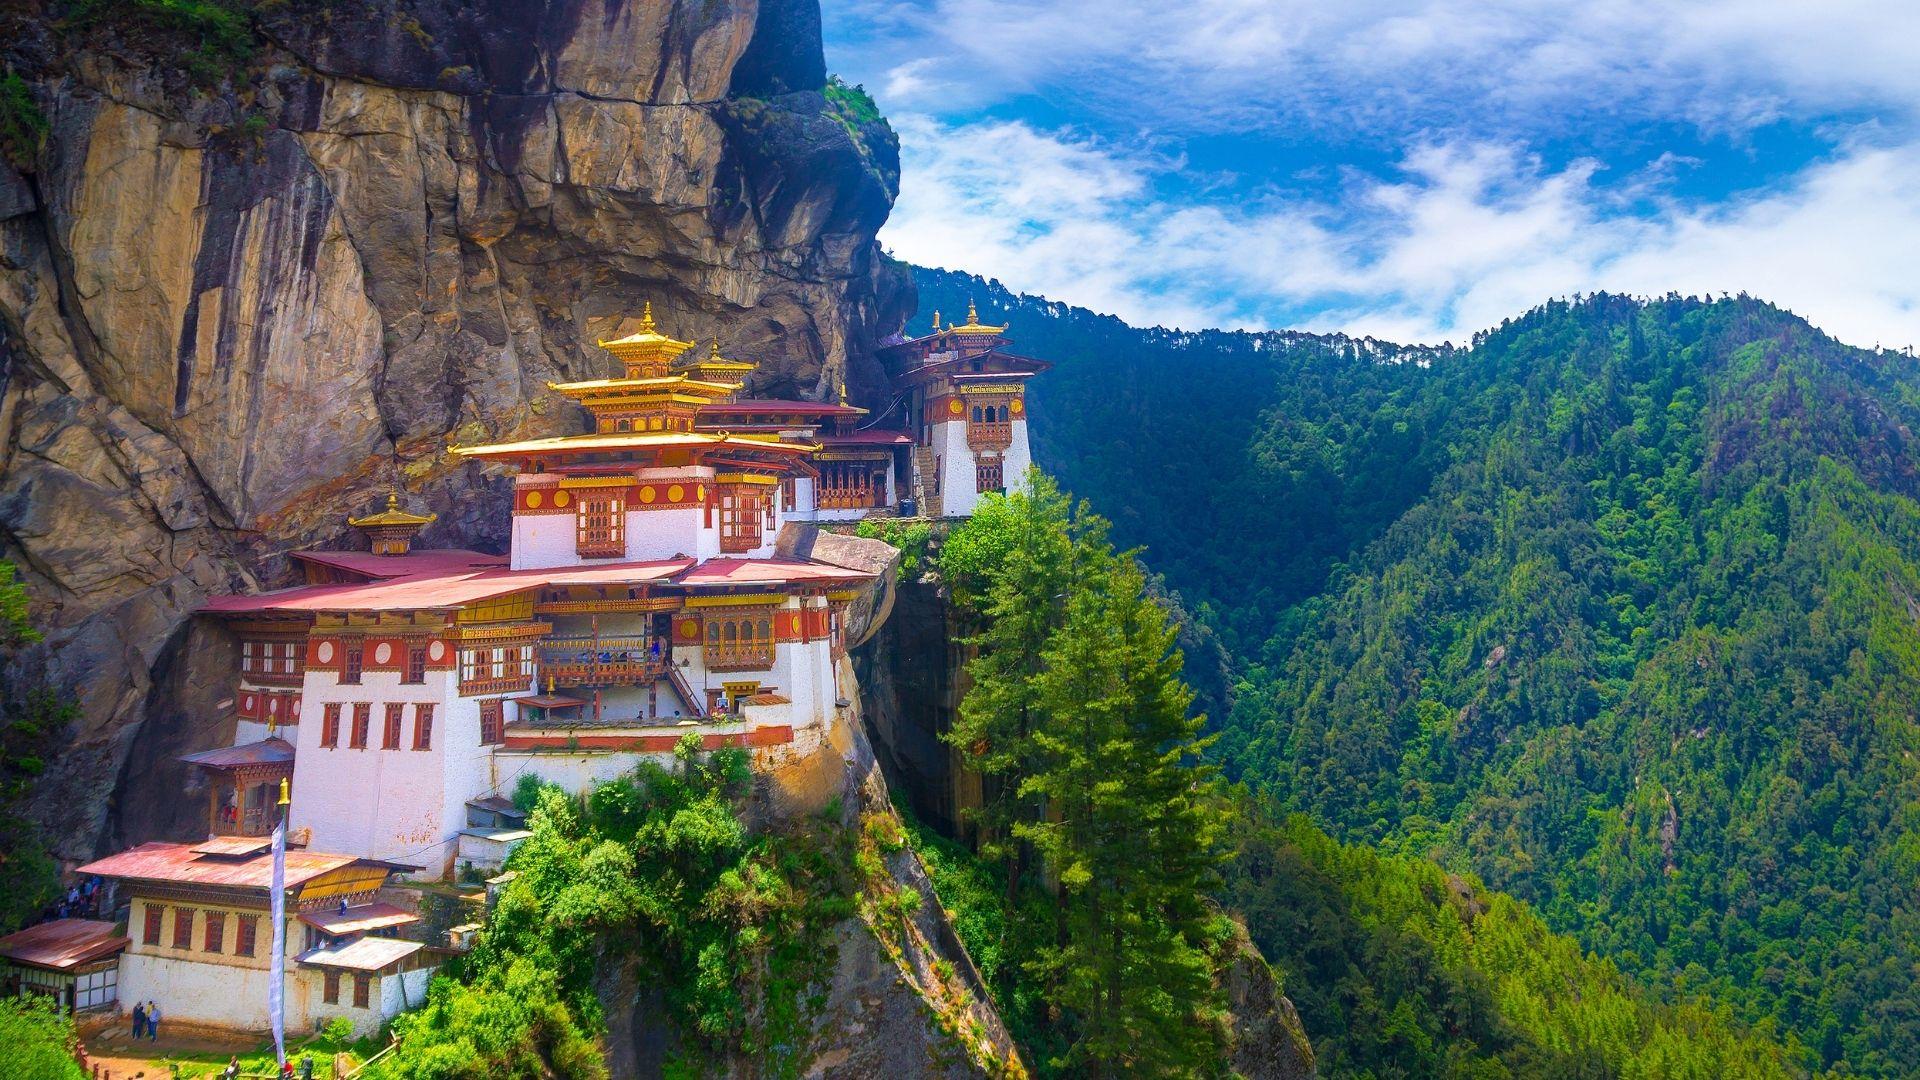 The Brahmaputra & Bhutan